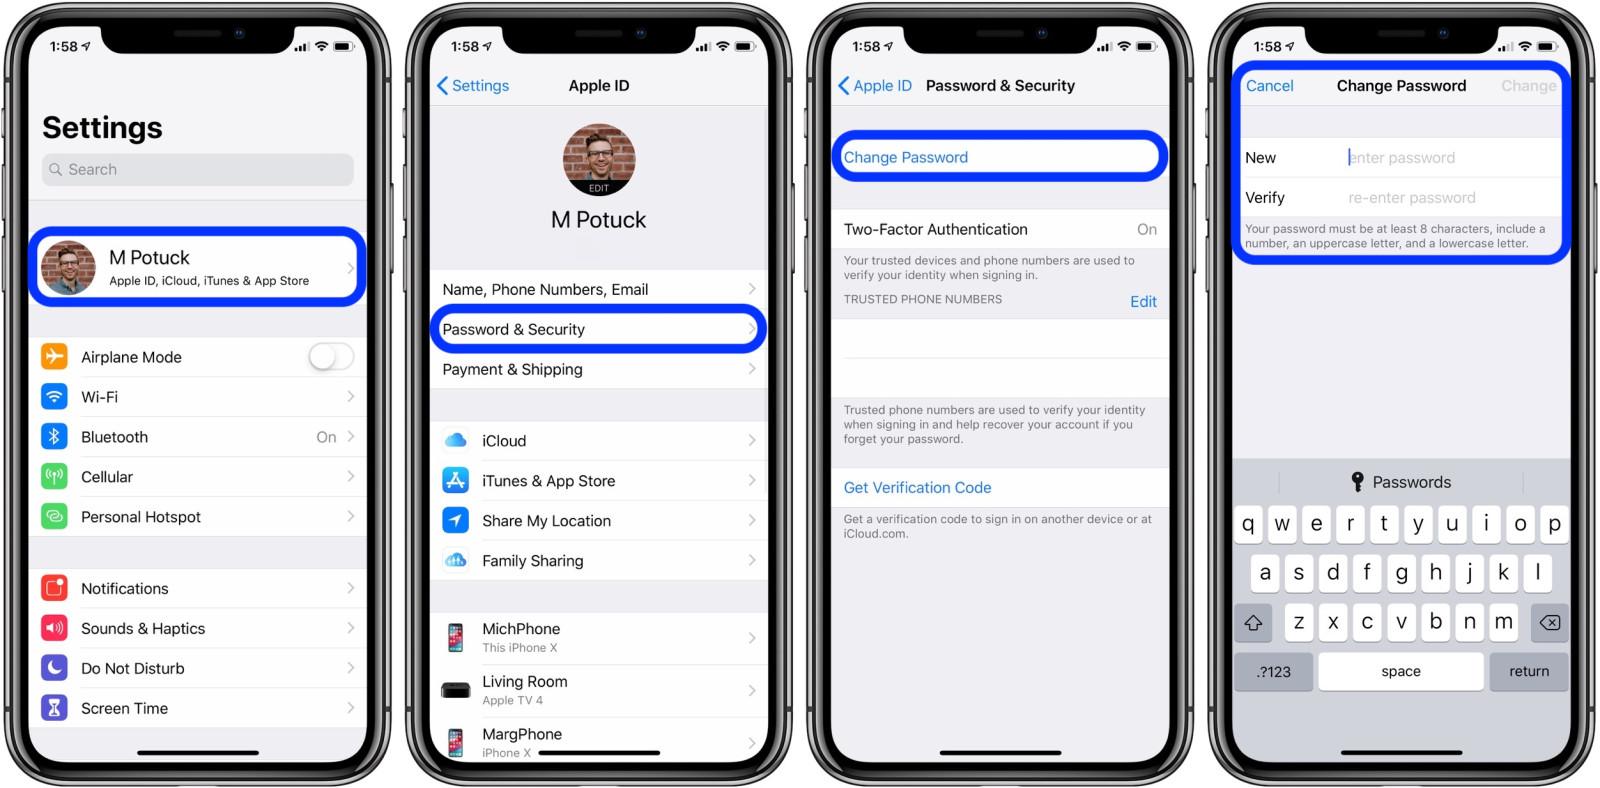 .jpg - بالصور.. تعرف على كيفية تغيير كلمة مرور حساب Apple ID على آيفون وآيباد